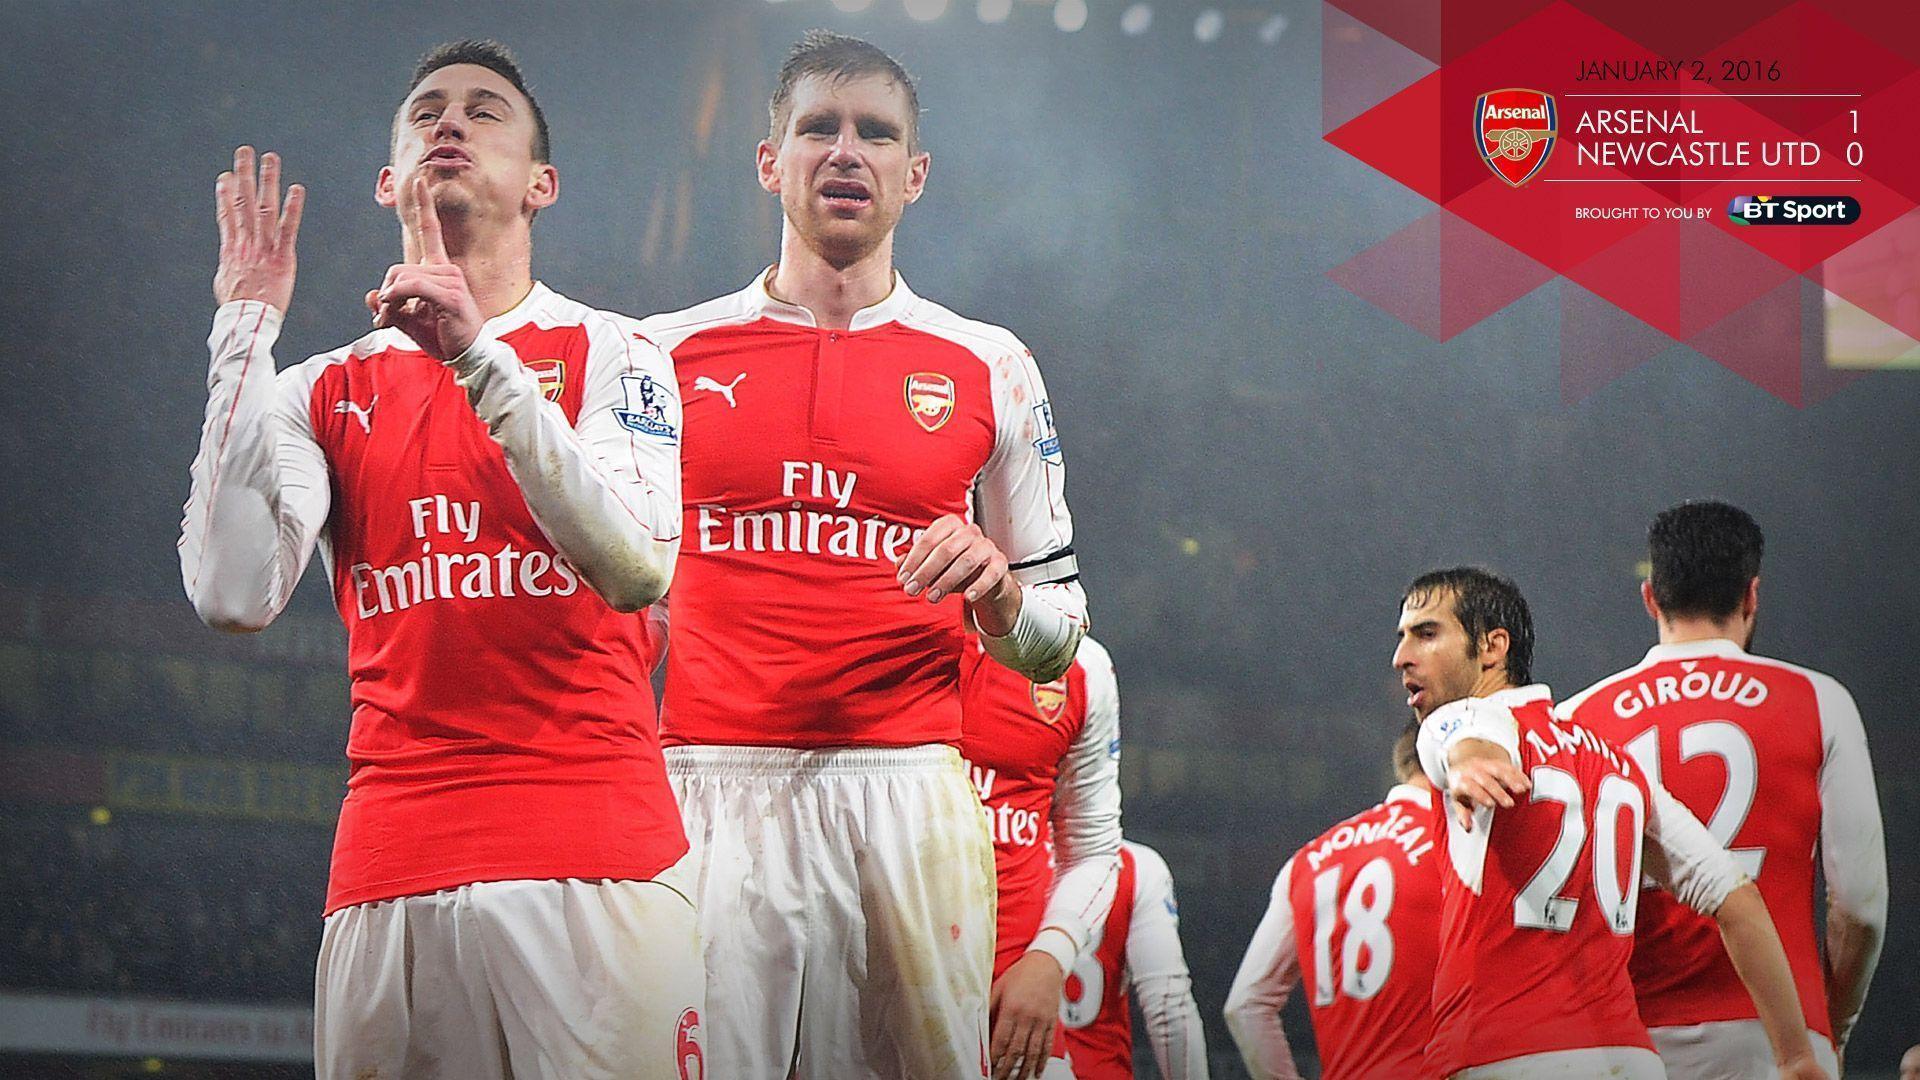 Aubameyang Arsenal Players Android Wallpaper   Arsenal Players 1920x1080